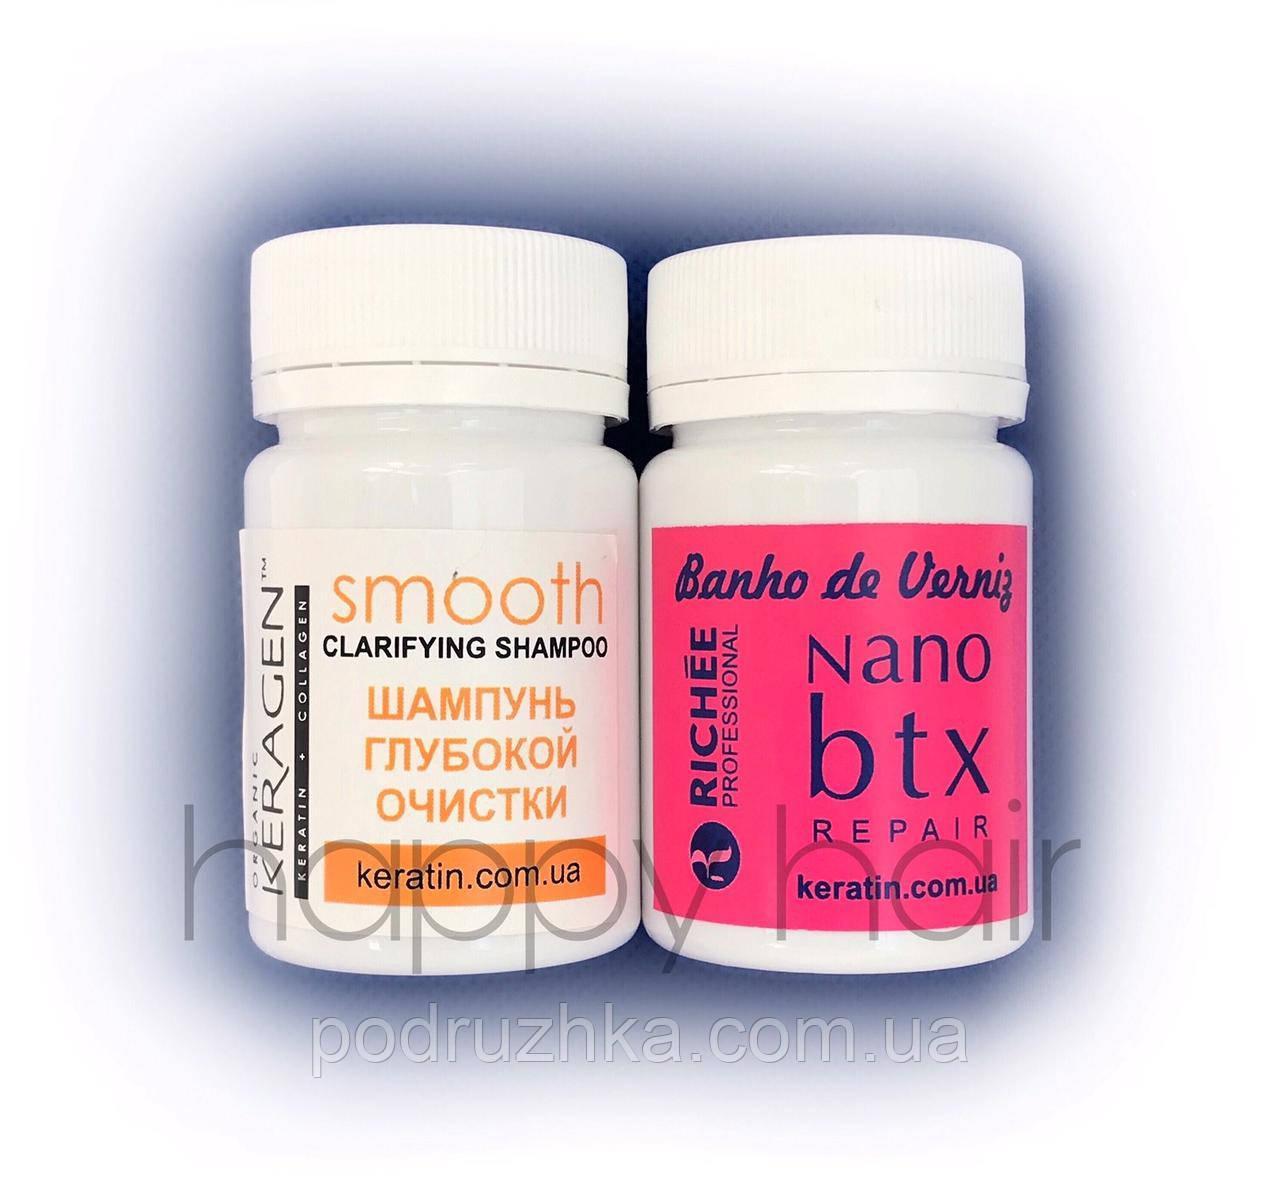 Richée Banho de Verniz Nano Btx Набор Ботокс-глянец для волос 30 мл/50 мл